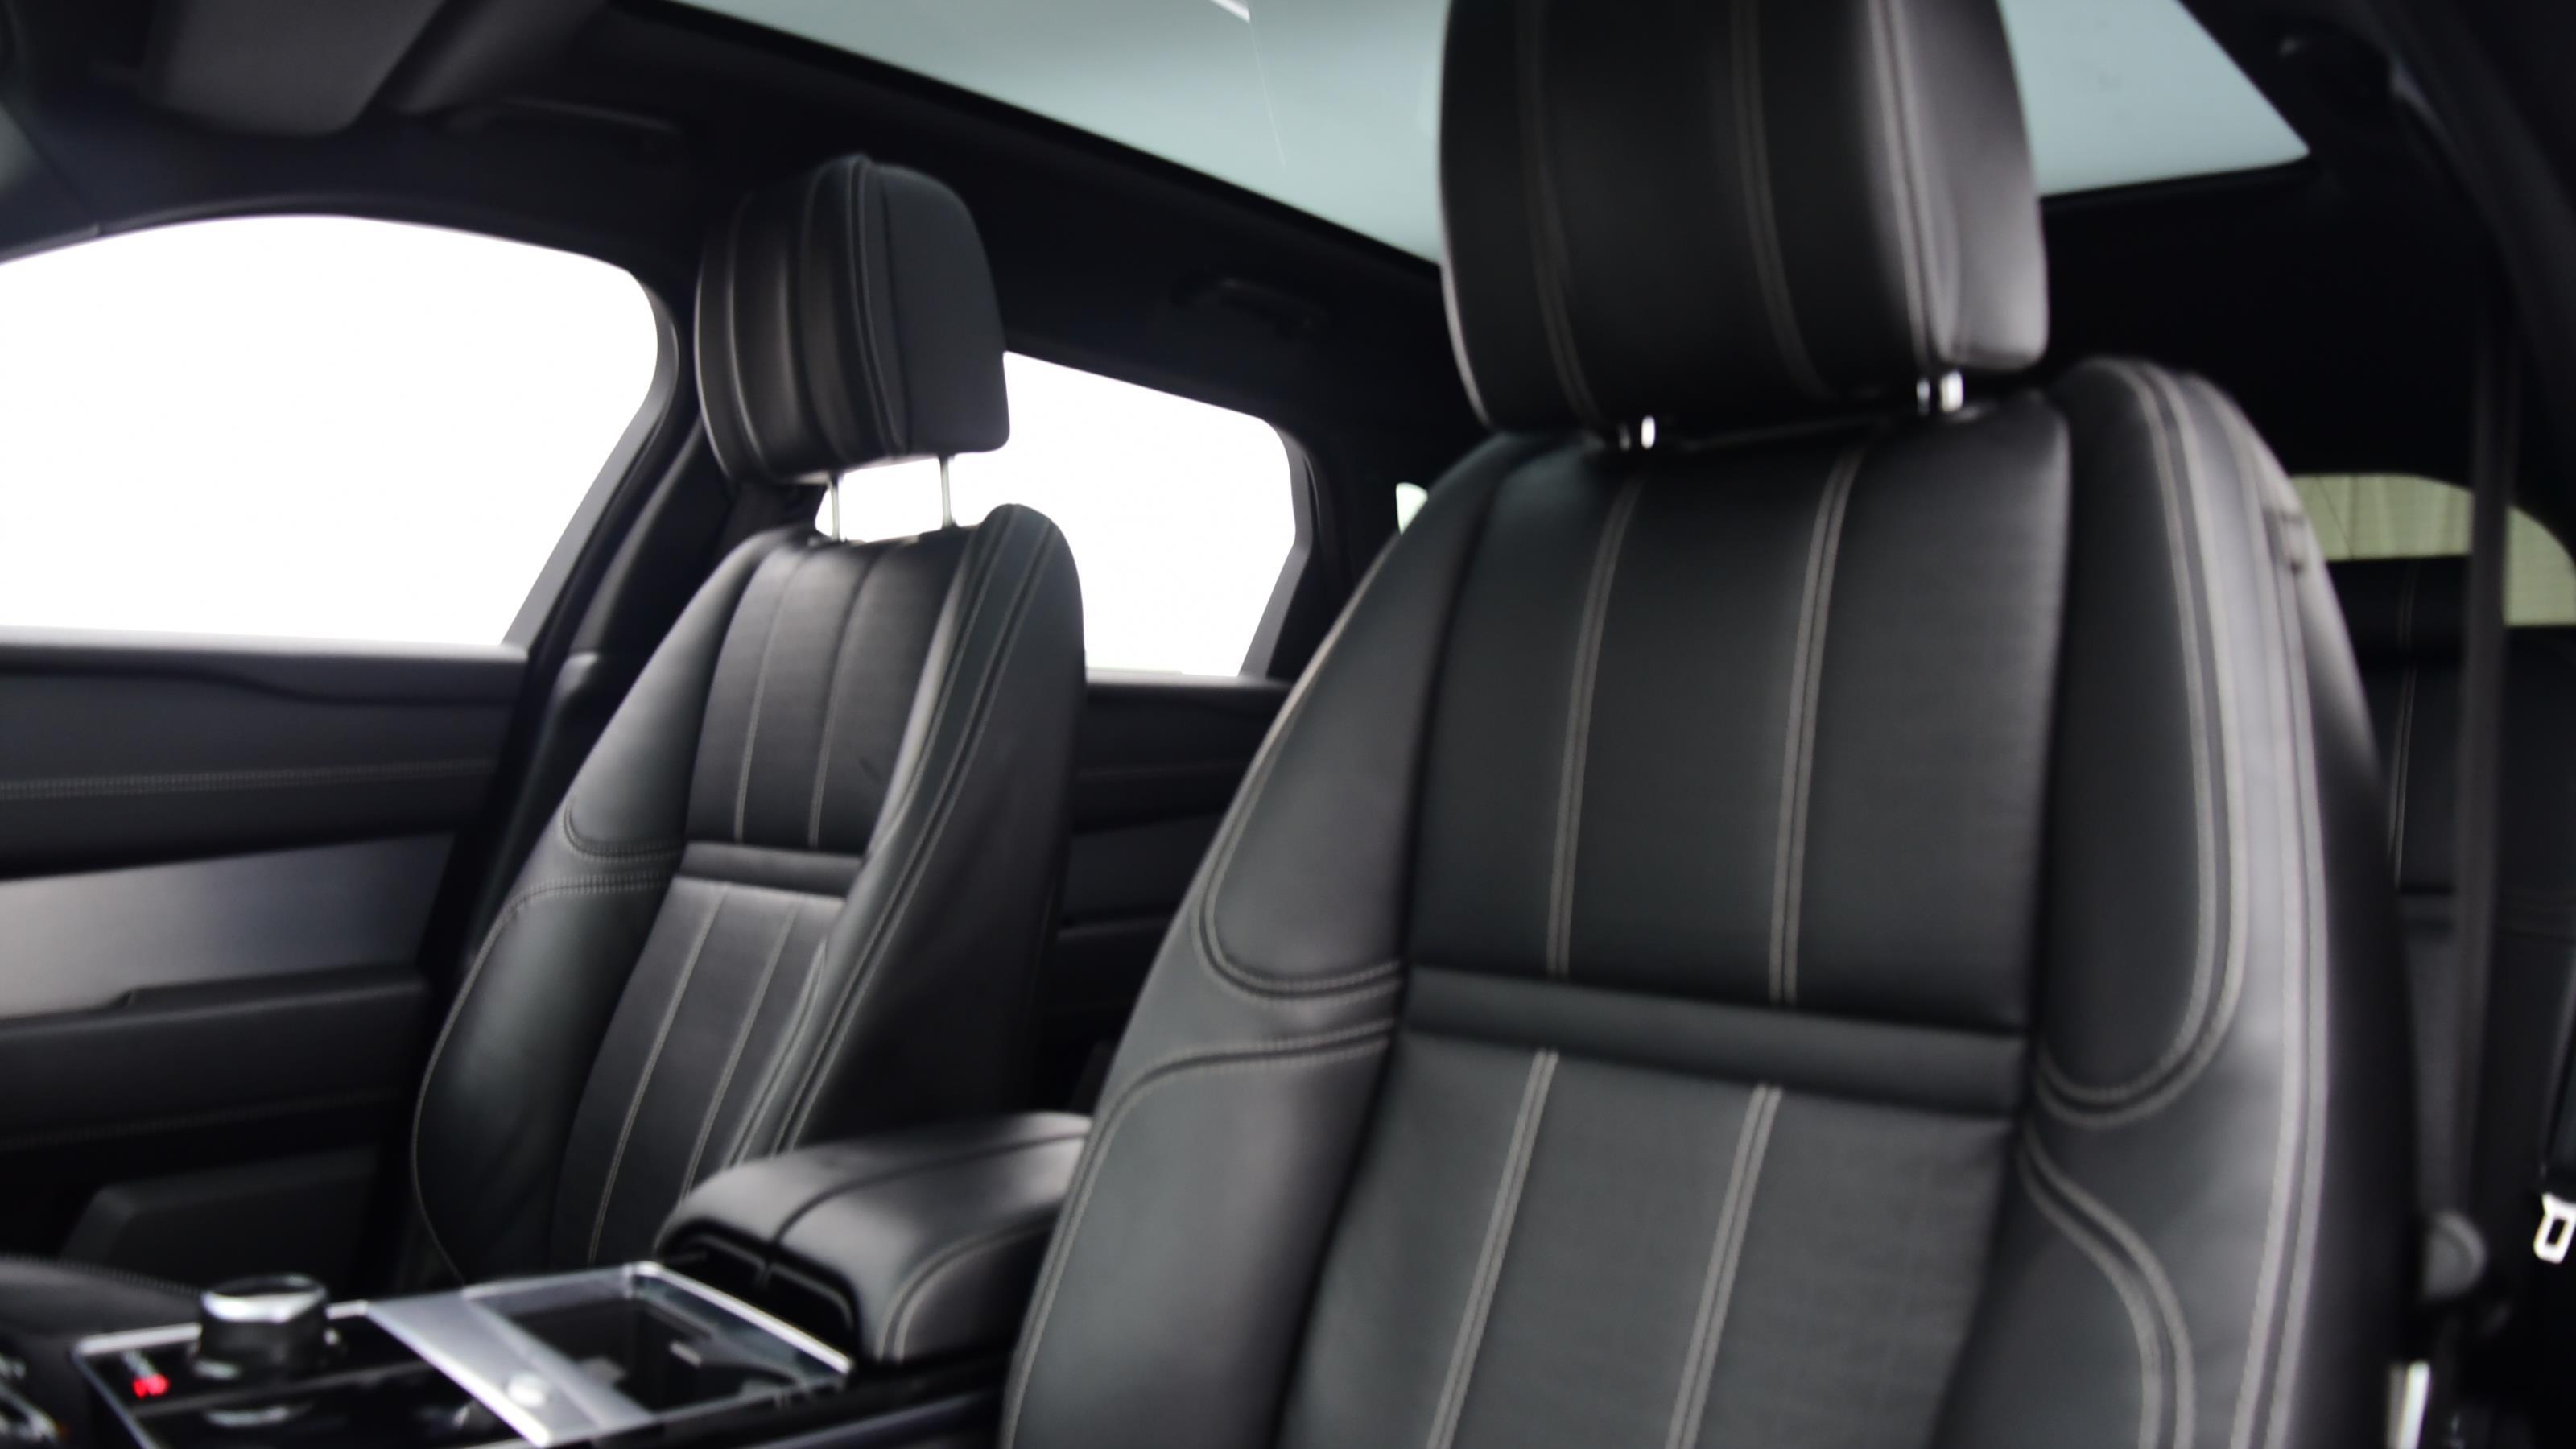 Used 2017 Land Rover RANGE ROVER VELAR 3.0 D300 R-Dynamic HSE 5dr Auto BLACK at Saxton4x4